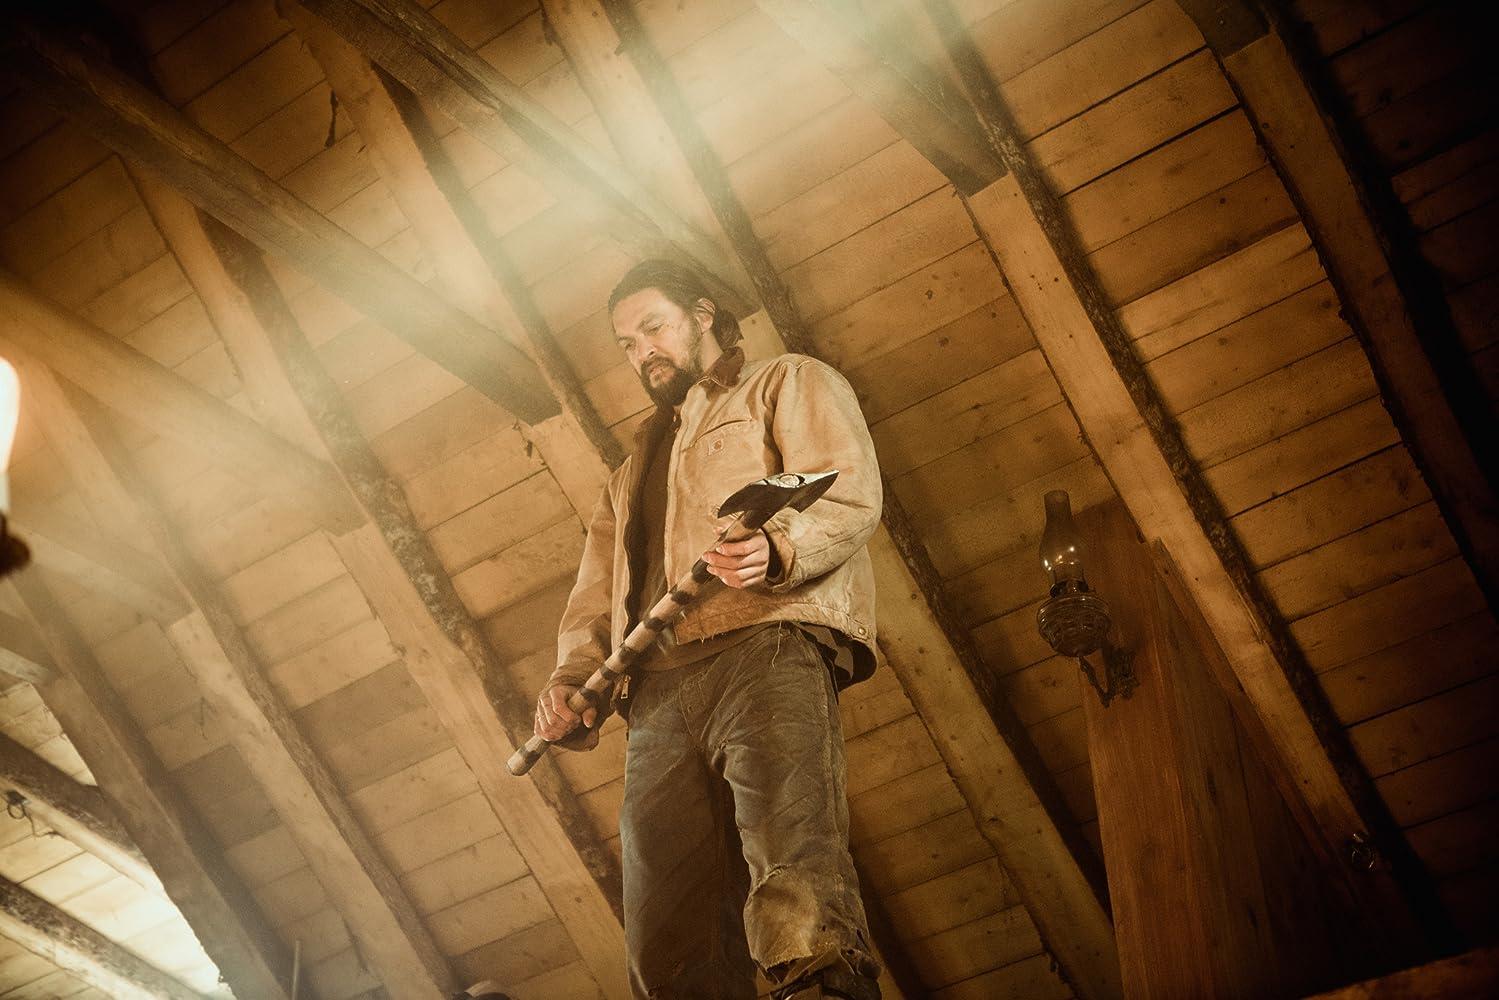 Jason Momoa in Braven (2018)